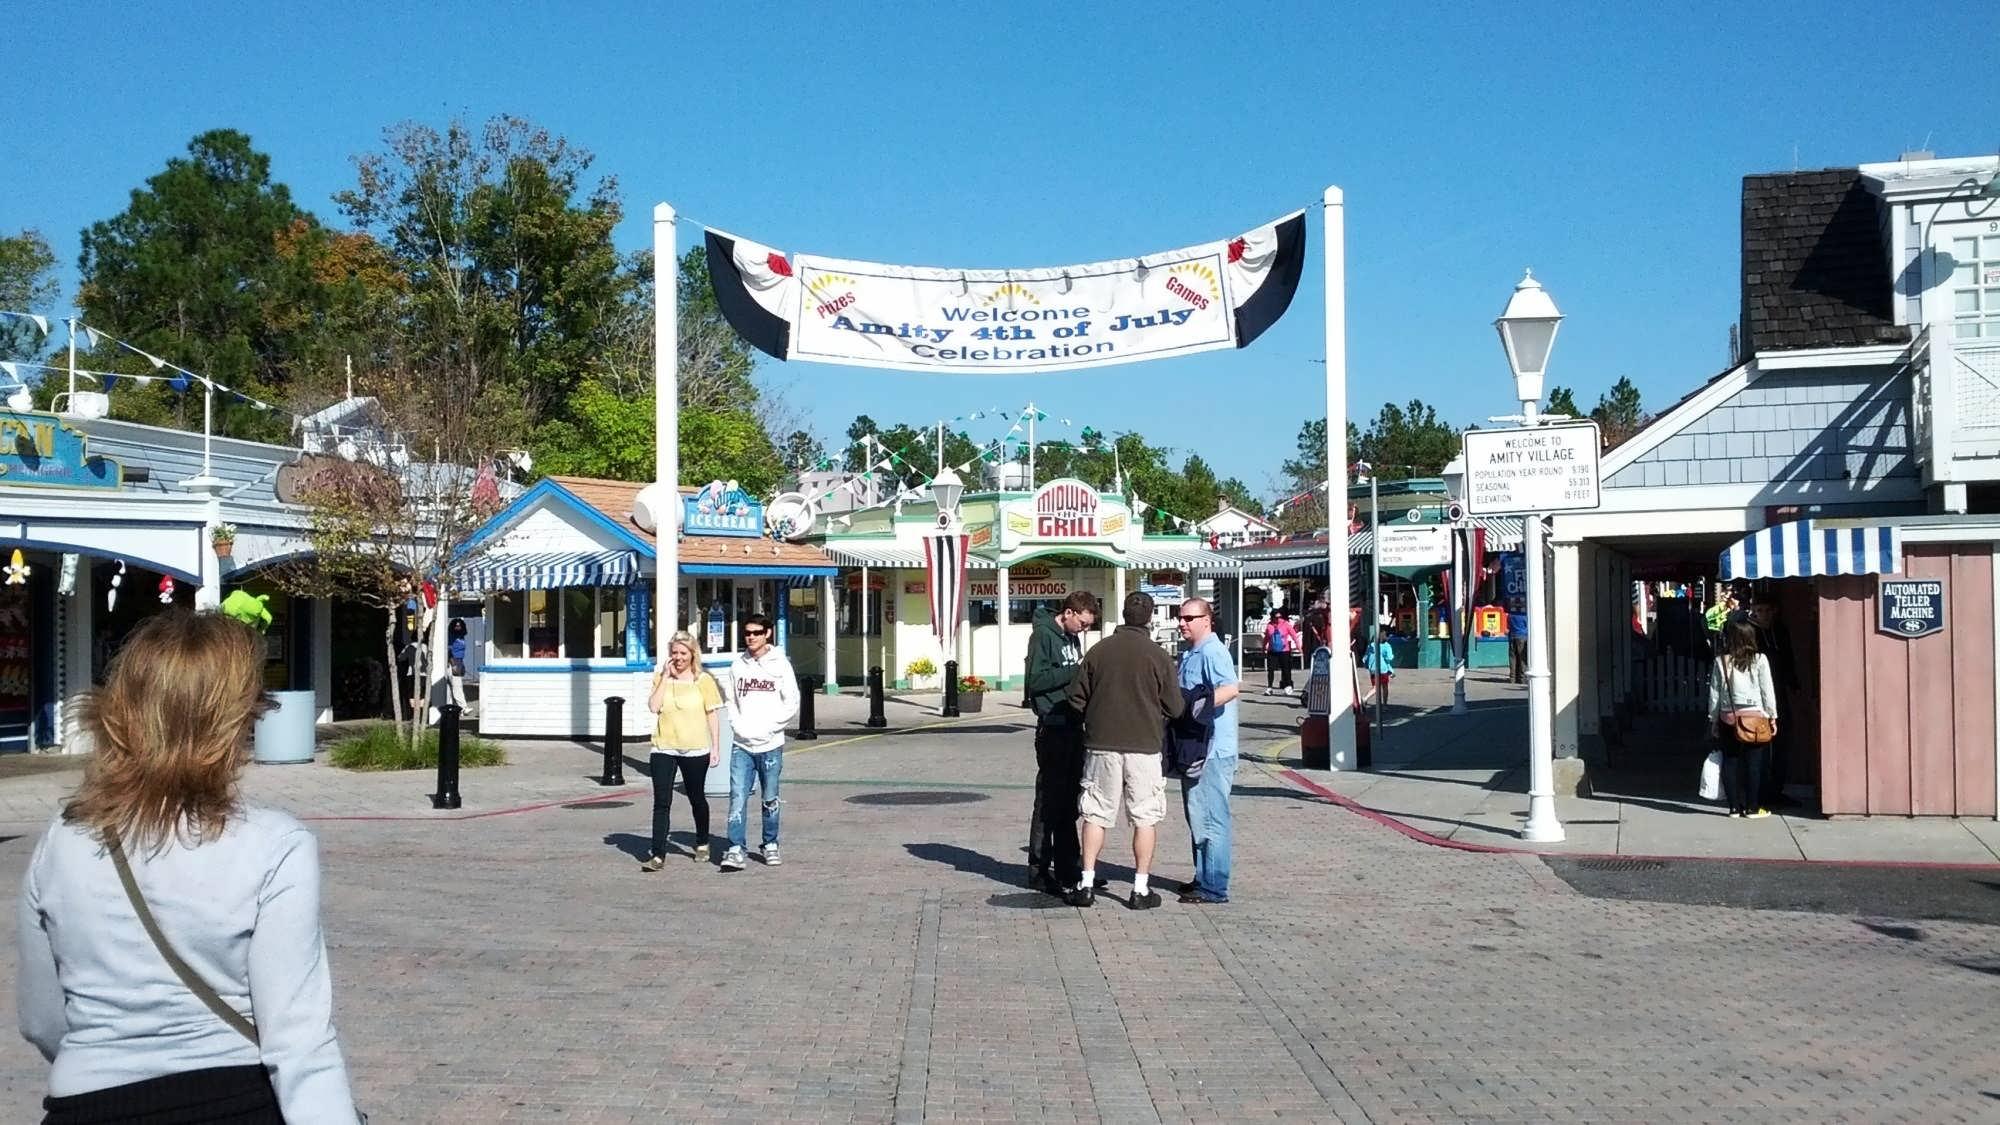 Universal Studios Florida trip report - early January 2012 ...